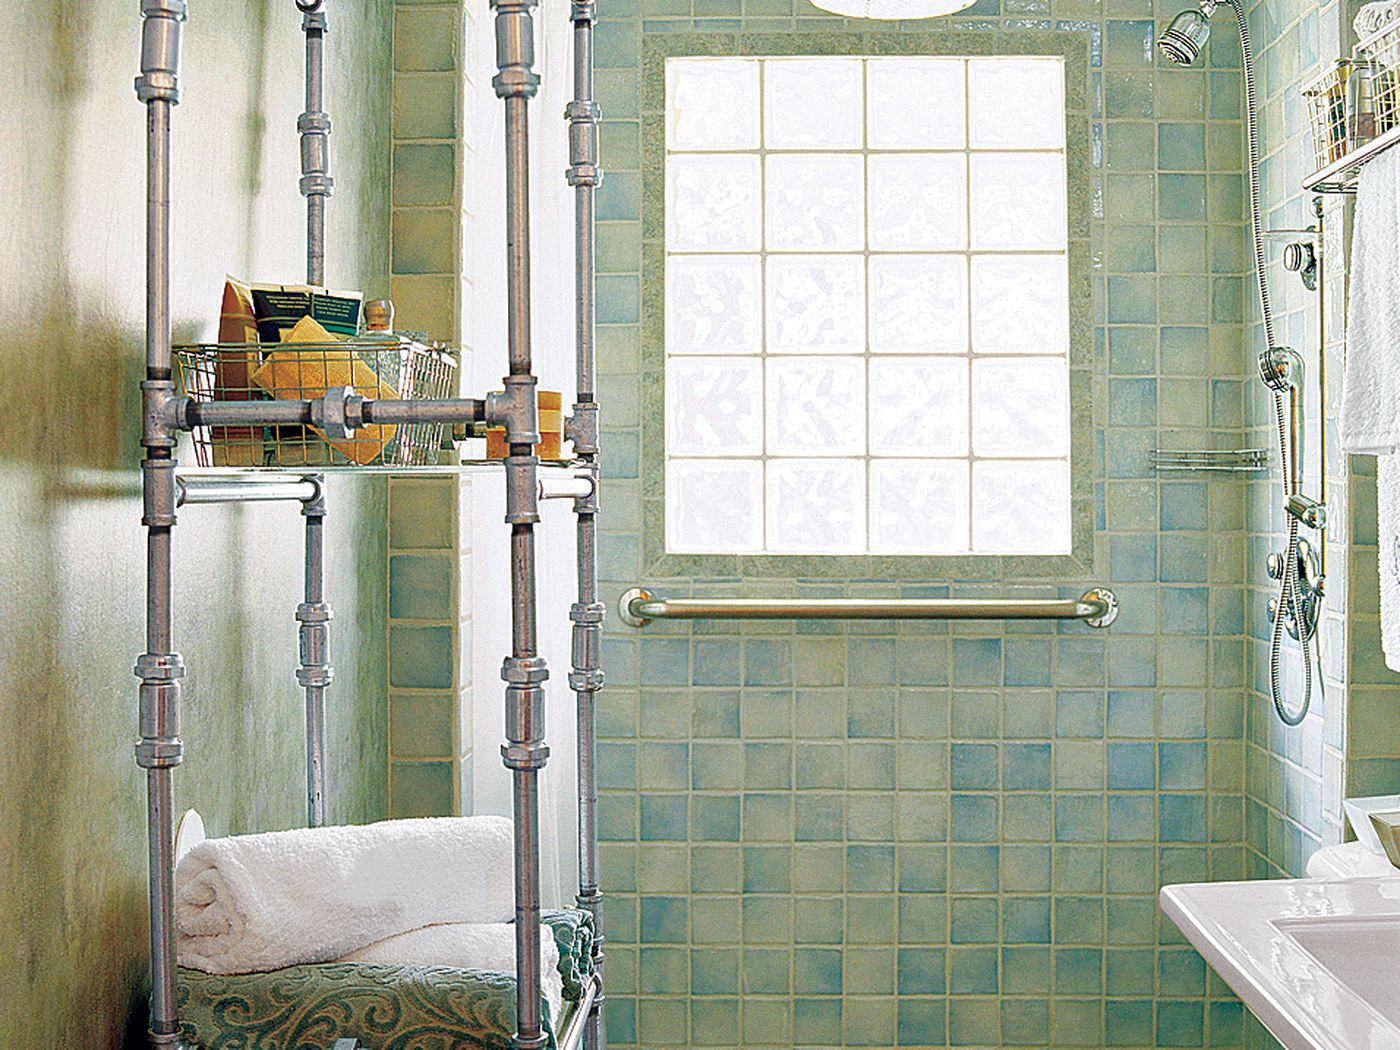 15 Small Bathroom Ideas This Old House